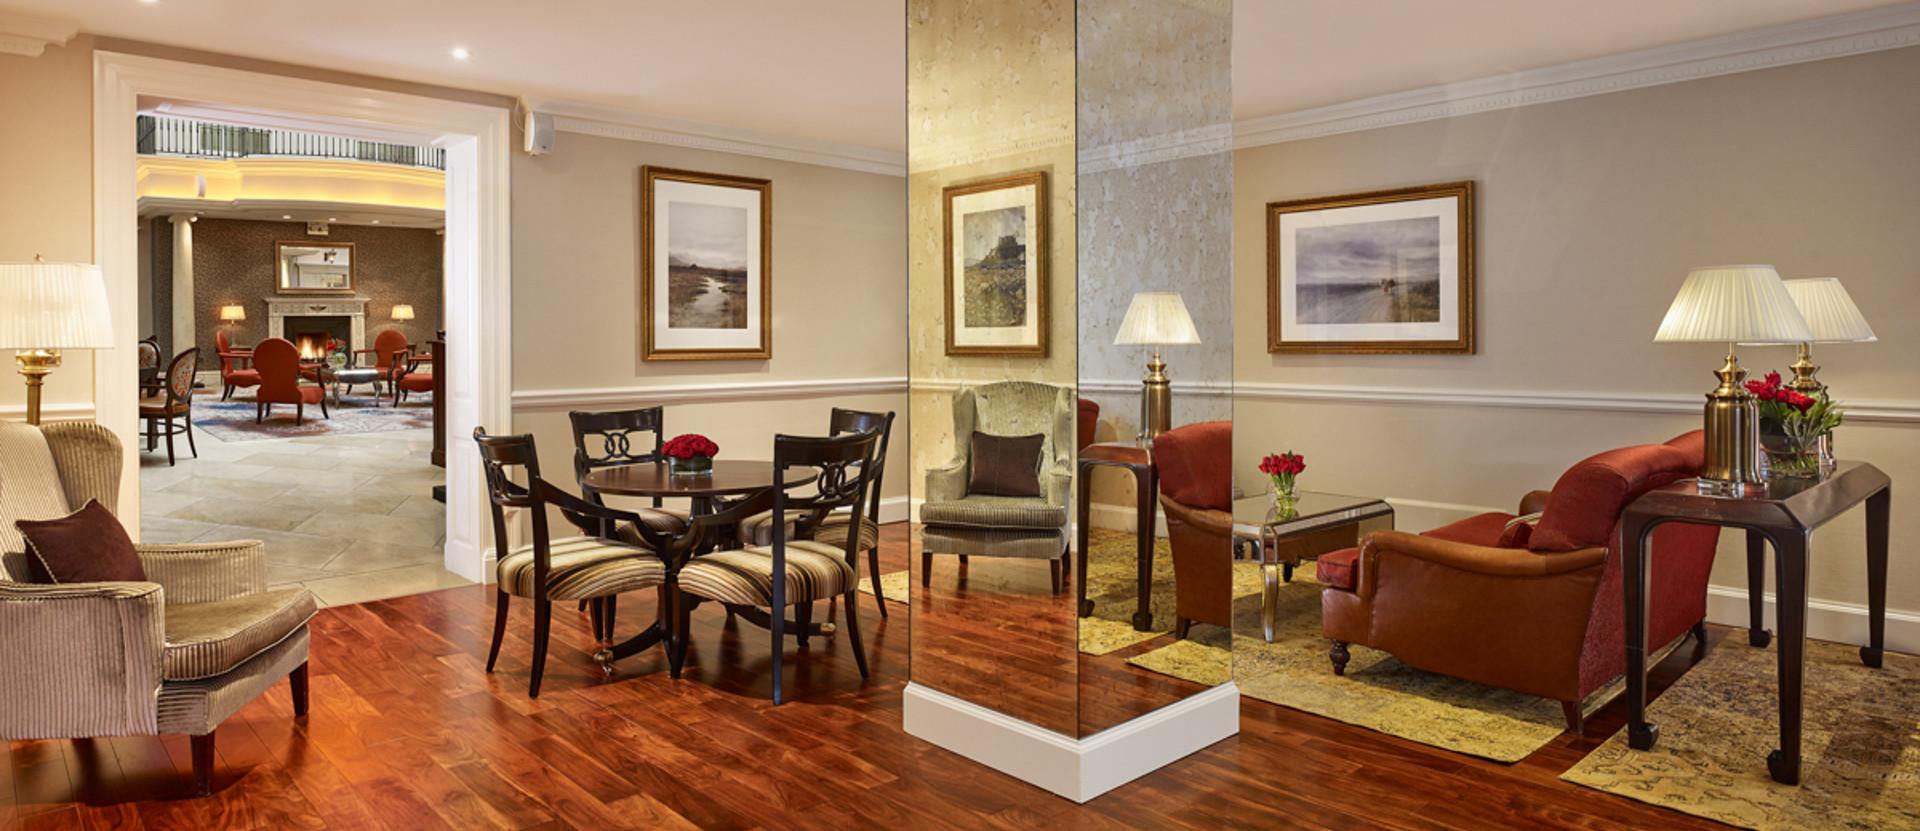 The Atrium Lounge - Parlour